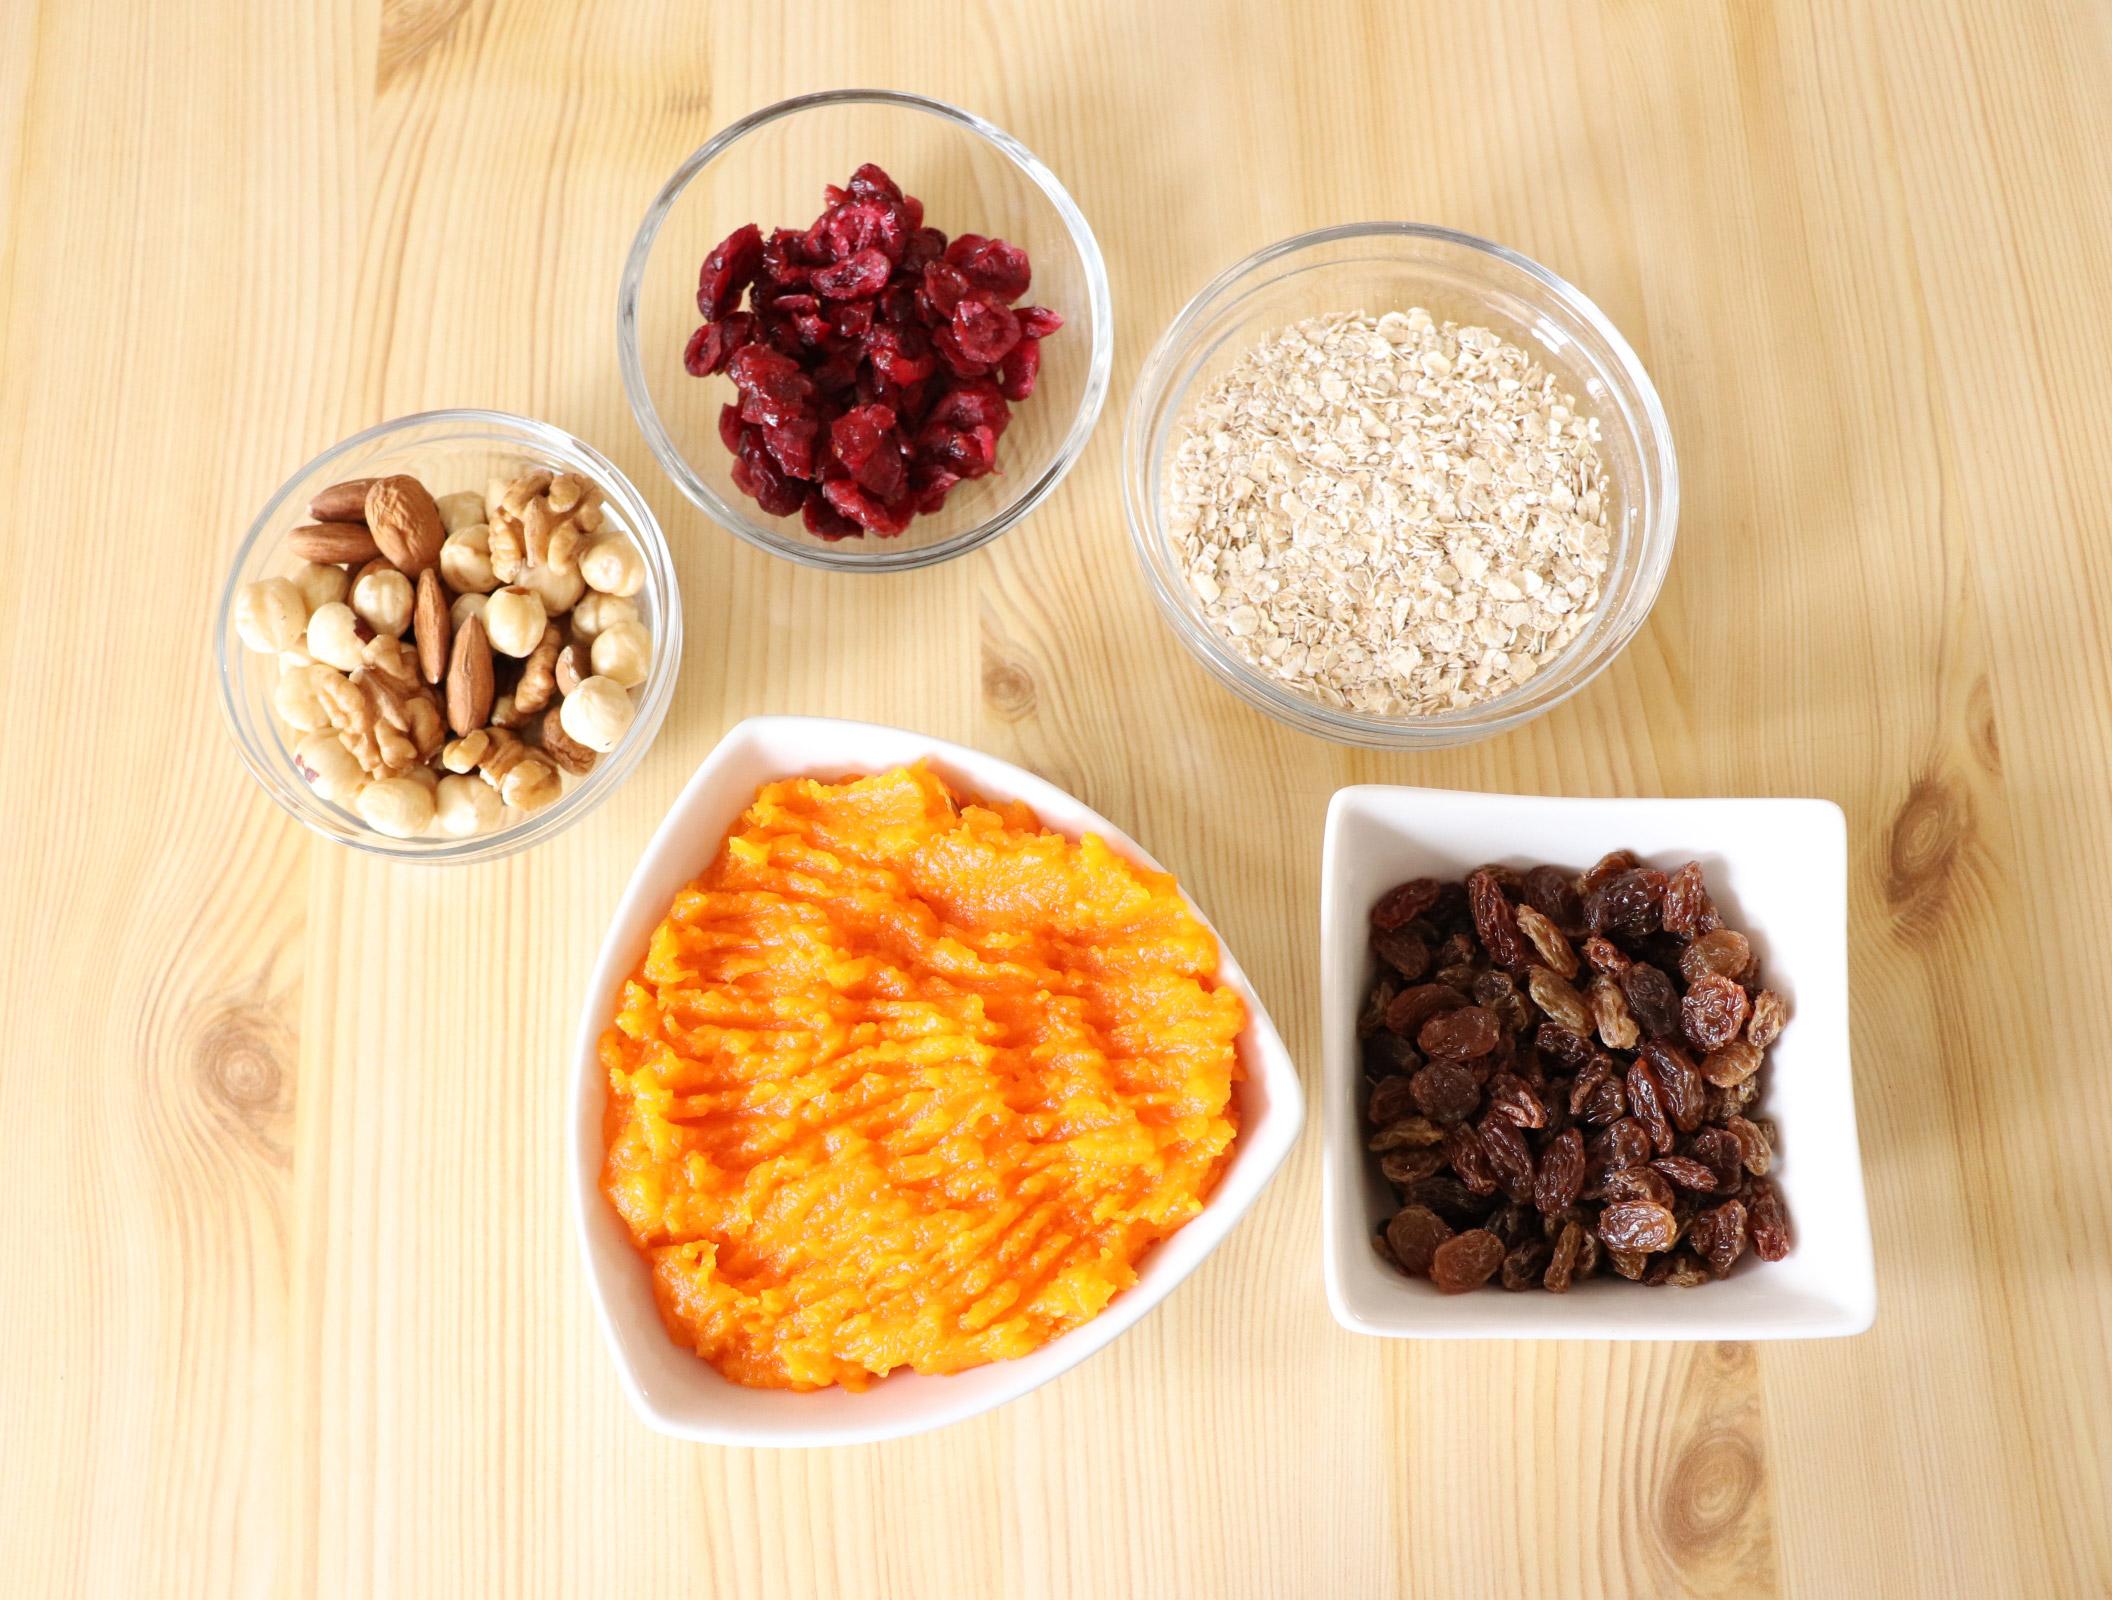 Simple ingredients for making healthy recipe using pumpkin puree